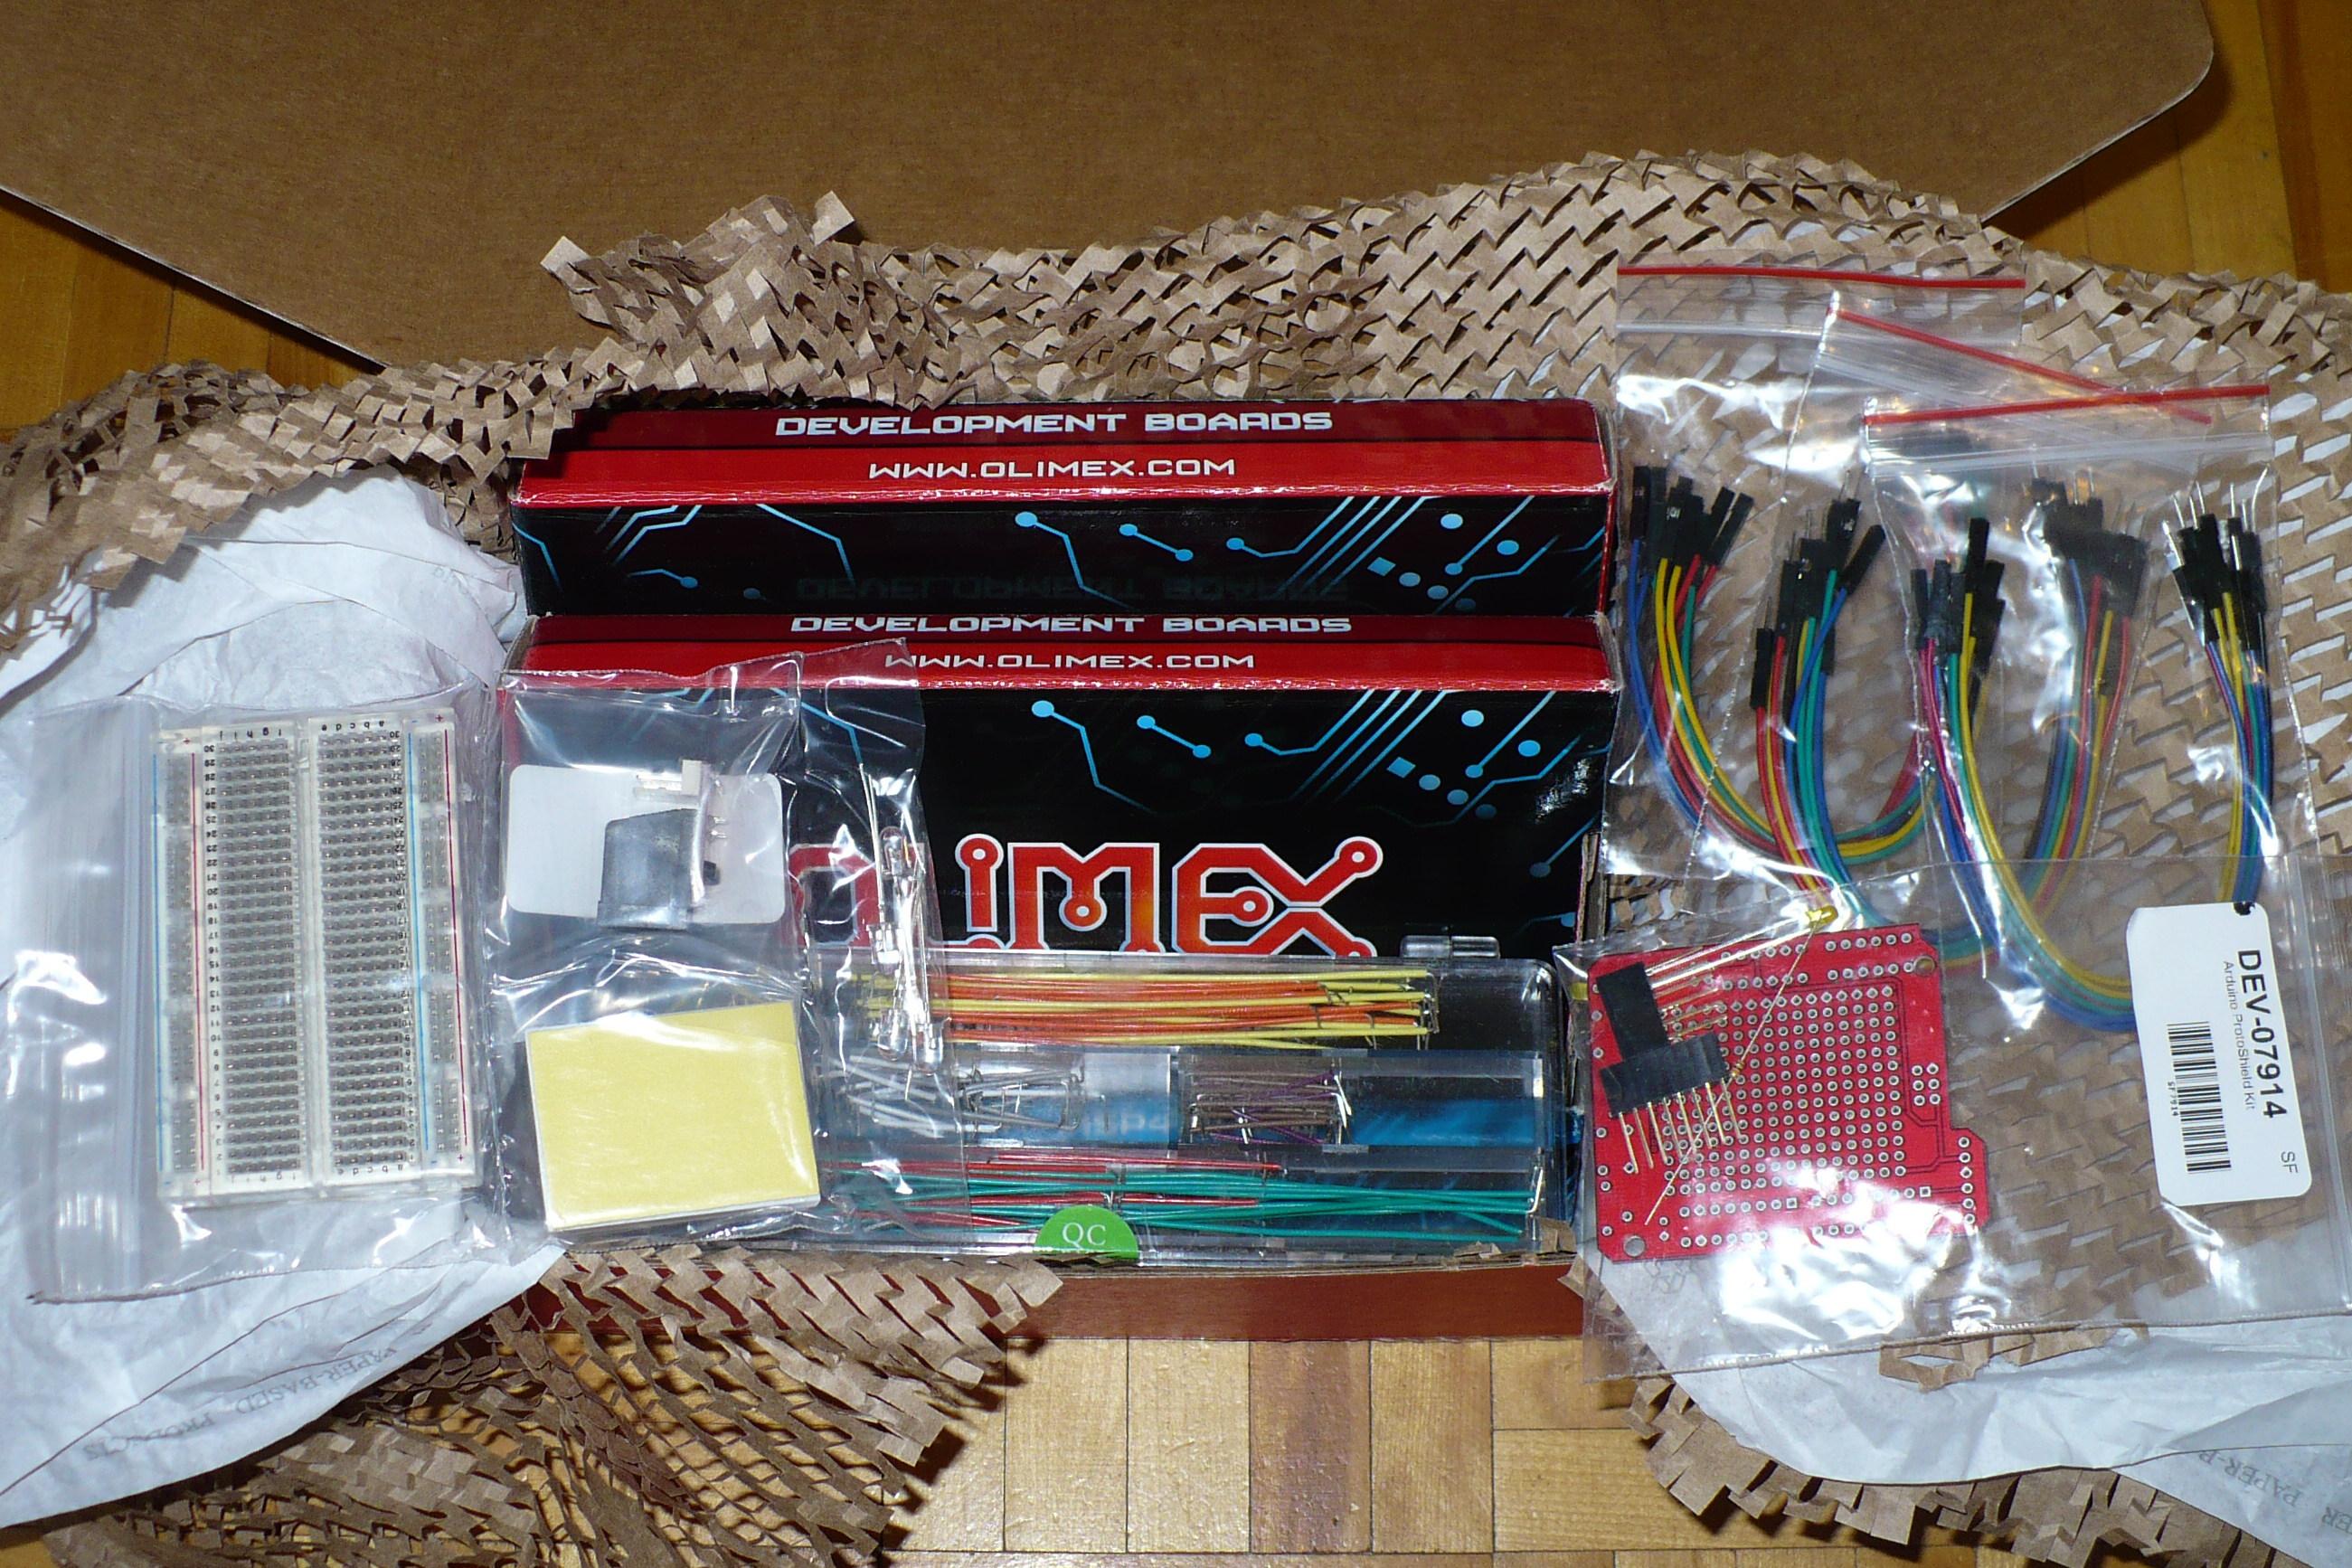 Sparkfun.com Stuff: Arduino Shield, Breadboarding Supplies, etc